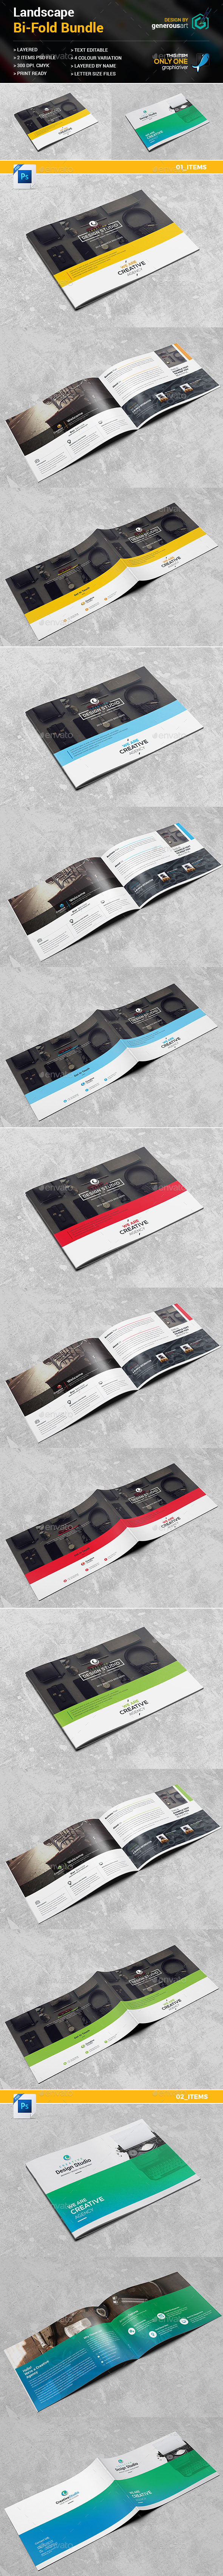 Landscape Bi-Fold Brochure 2 in 1 - Corporate Brochures